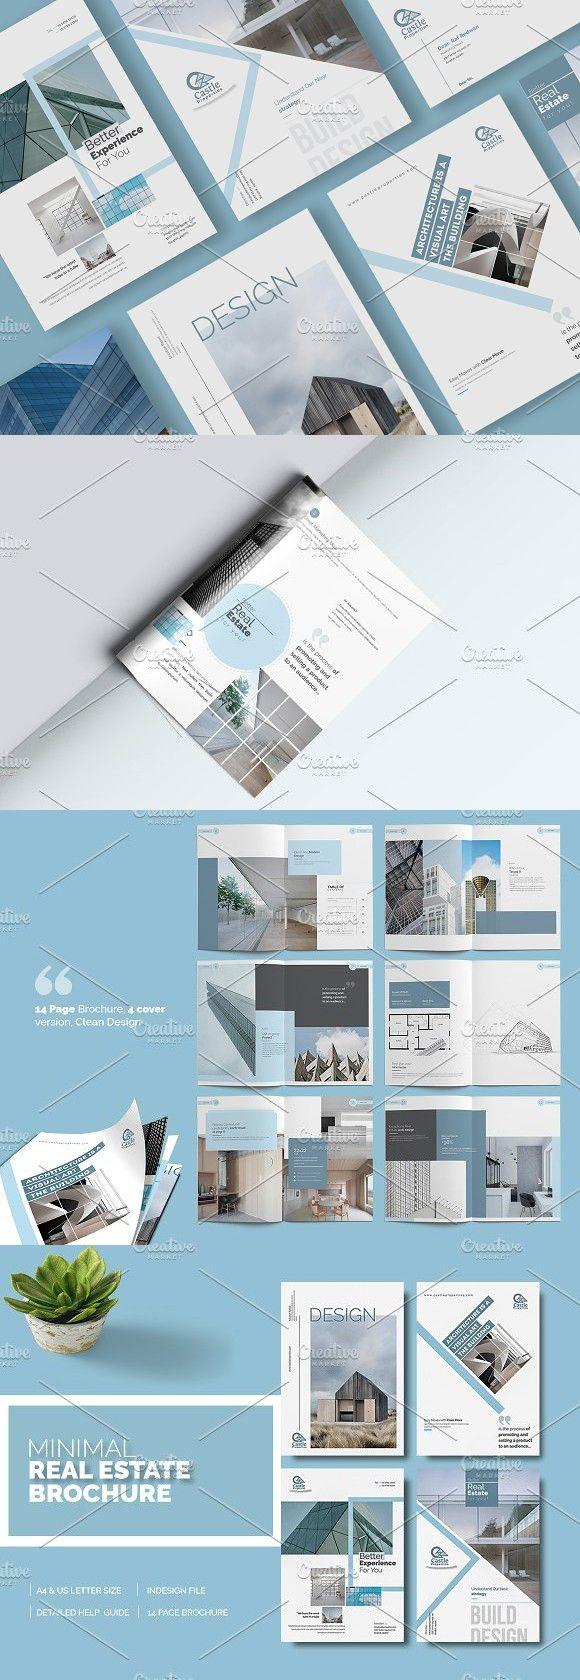 Minimal Real Estate Brochure | Real estate brochures, Brochure, Coffee table book design